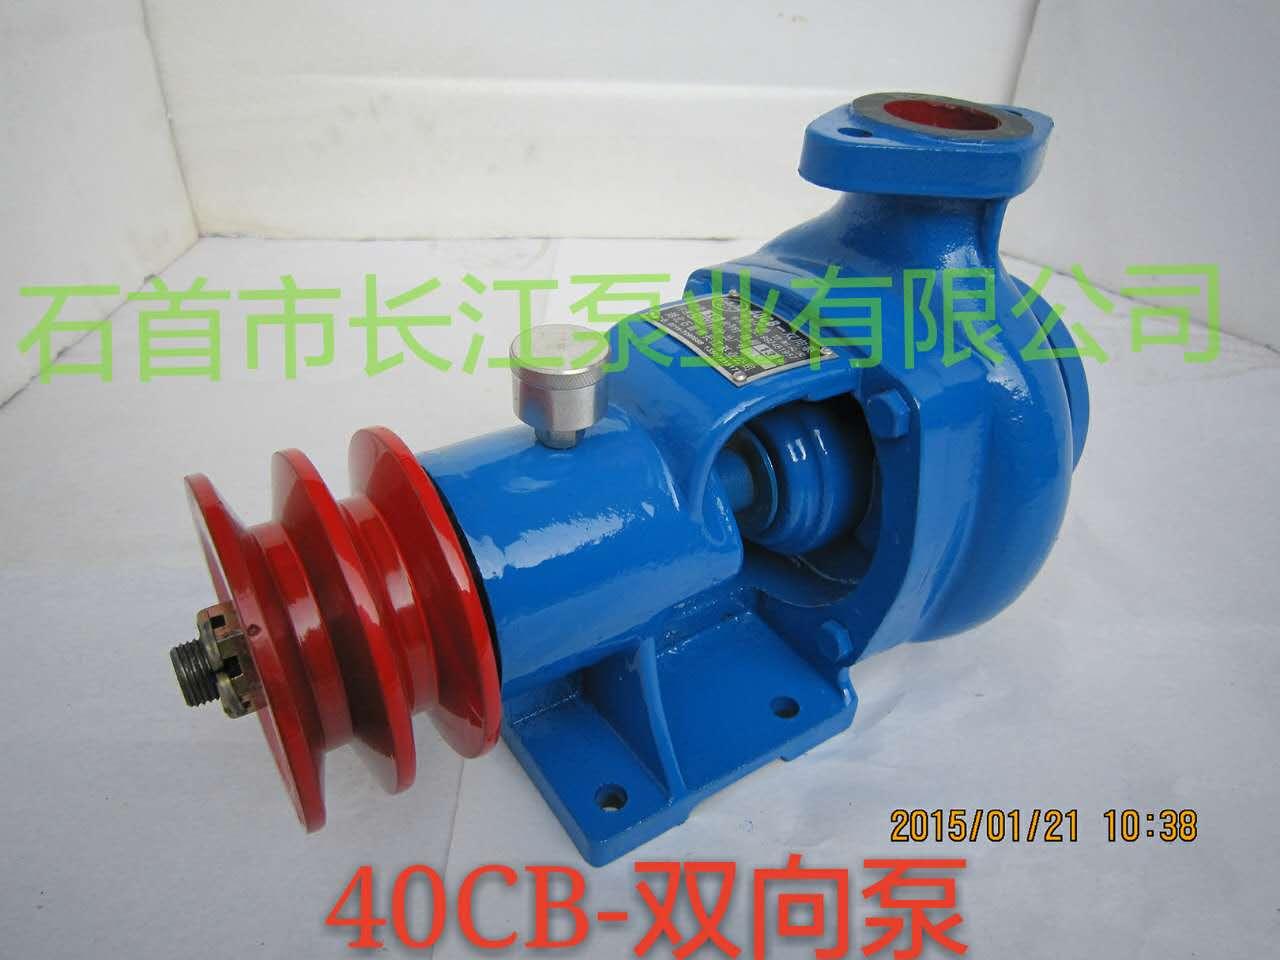 40CB双向泵 船用柴油机循环泵